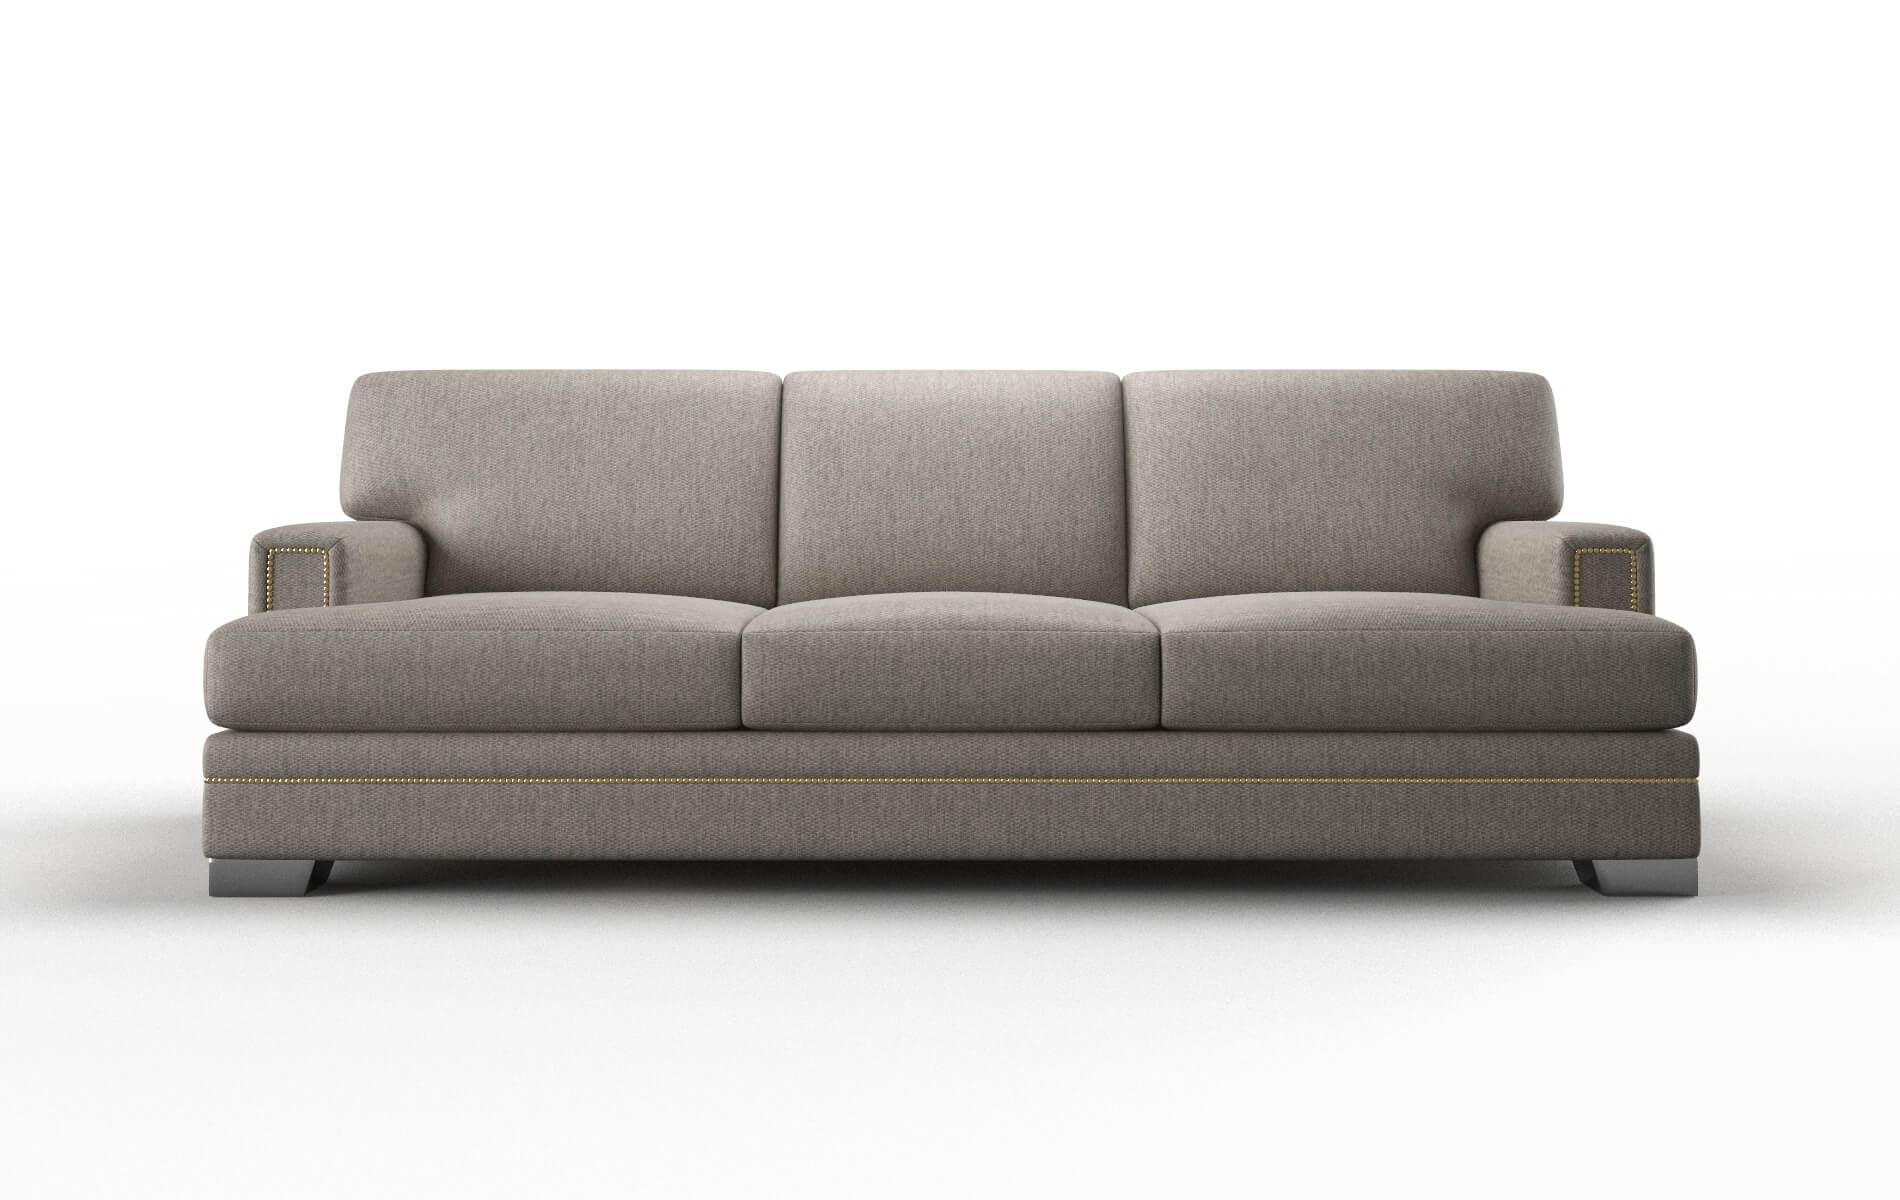 Barcelona Cosmo Taupe Sofa metal legs 1